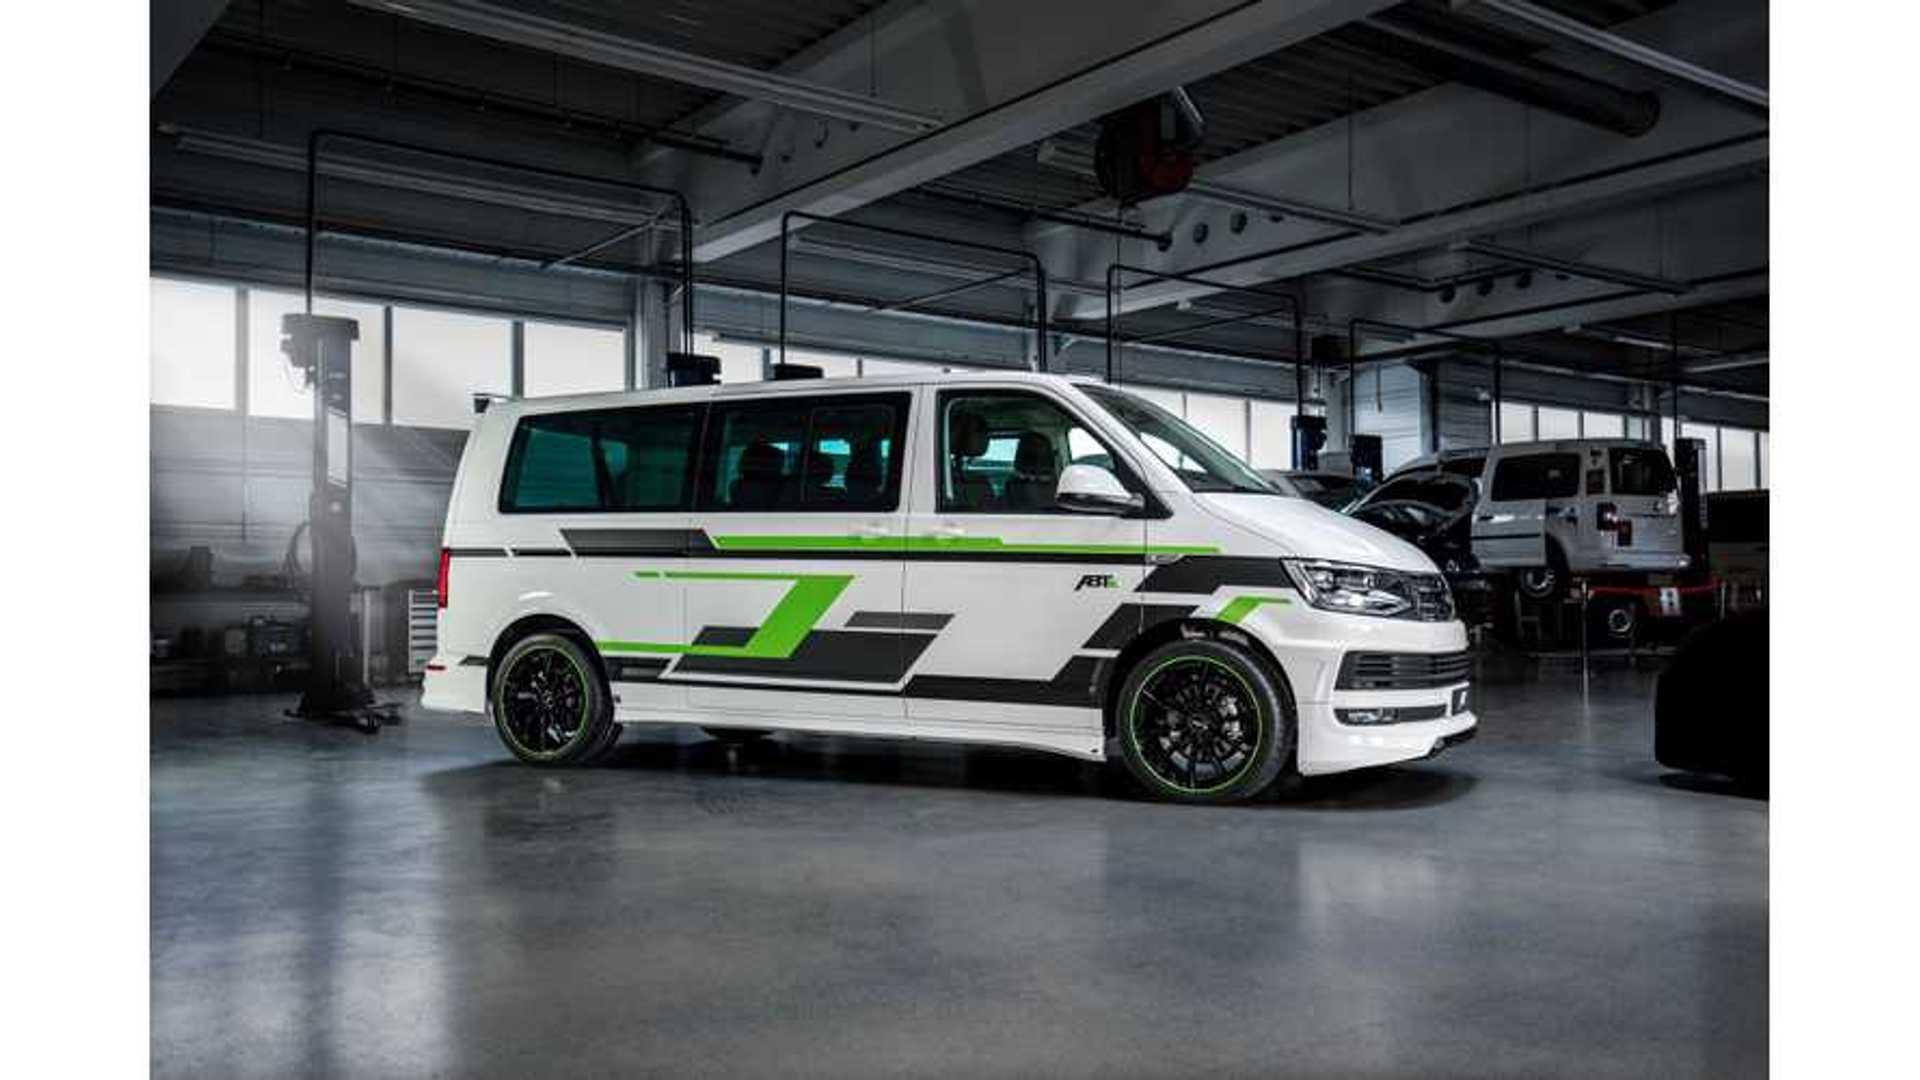 Abt Vw E Transporter Tuned Electric Van Revealed